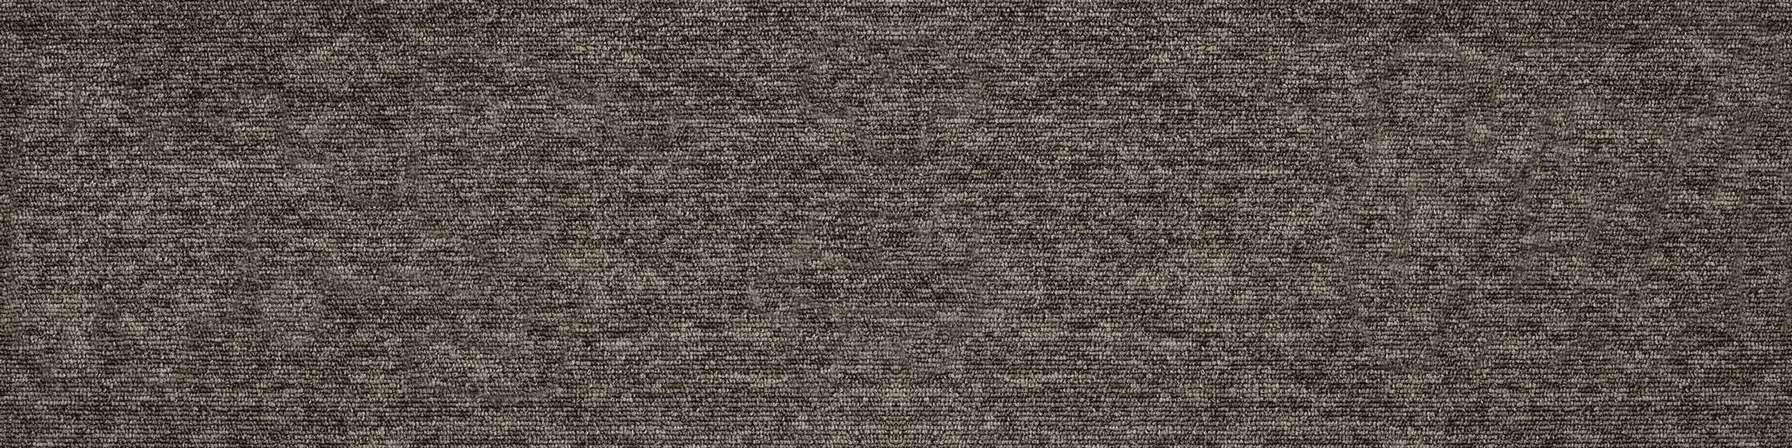 tivoli 21145 dominica dawn carpet plank